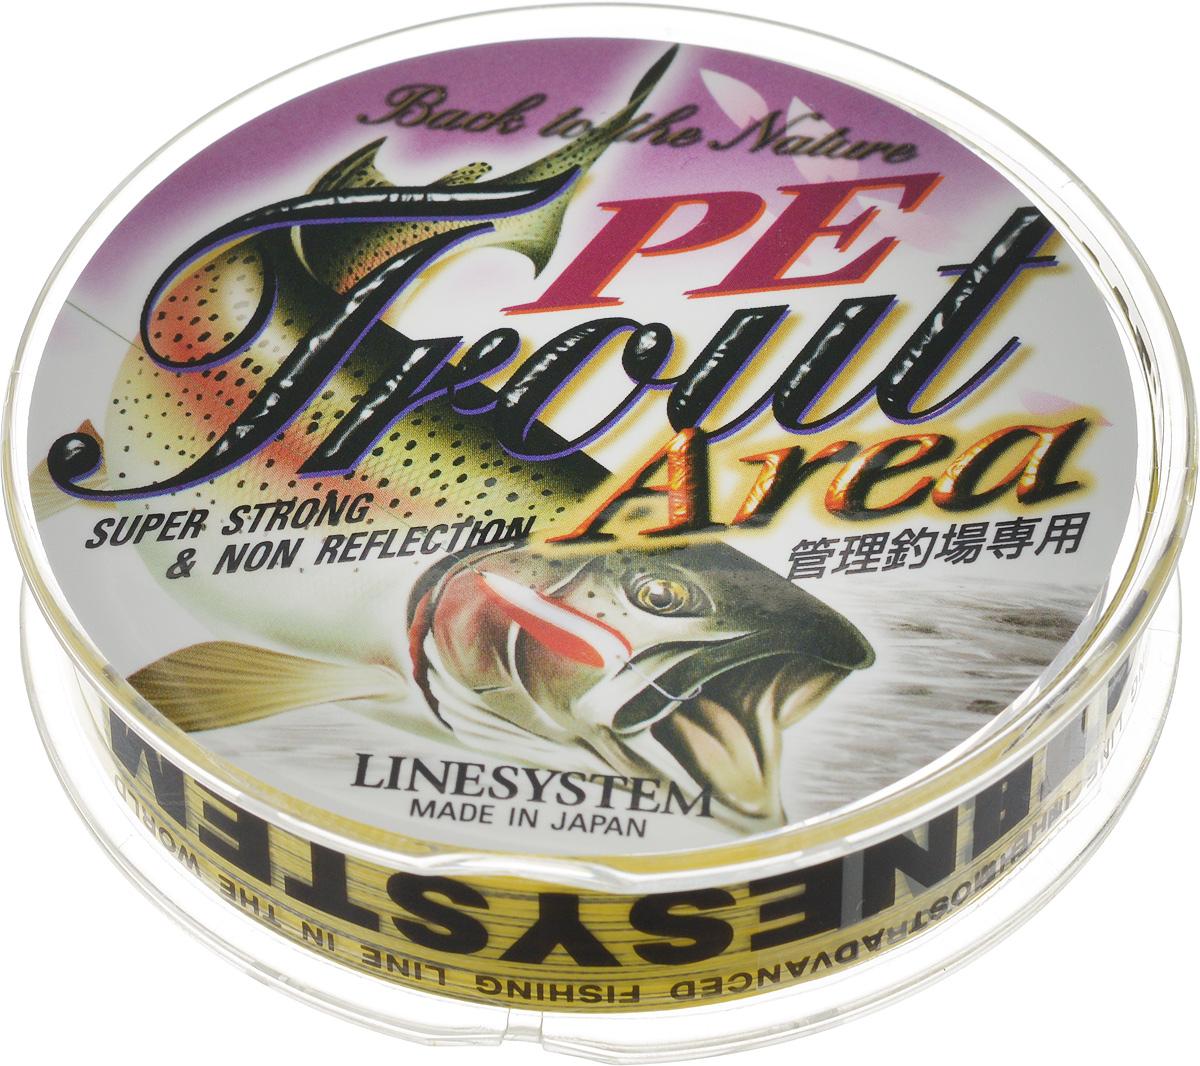 Шнур Trout Area  Linesystem , плетеный, цвет: желтый, черный, диаметр 0,05 мм, длина 75 м - Рыбалка